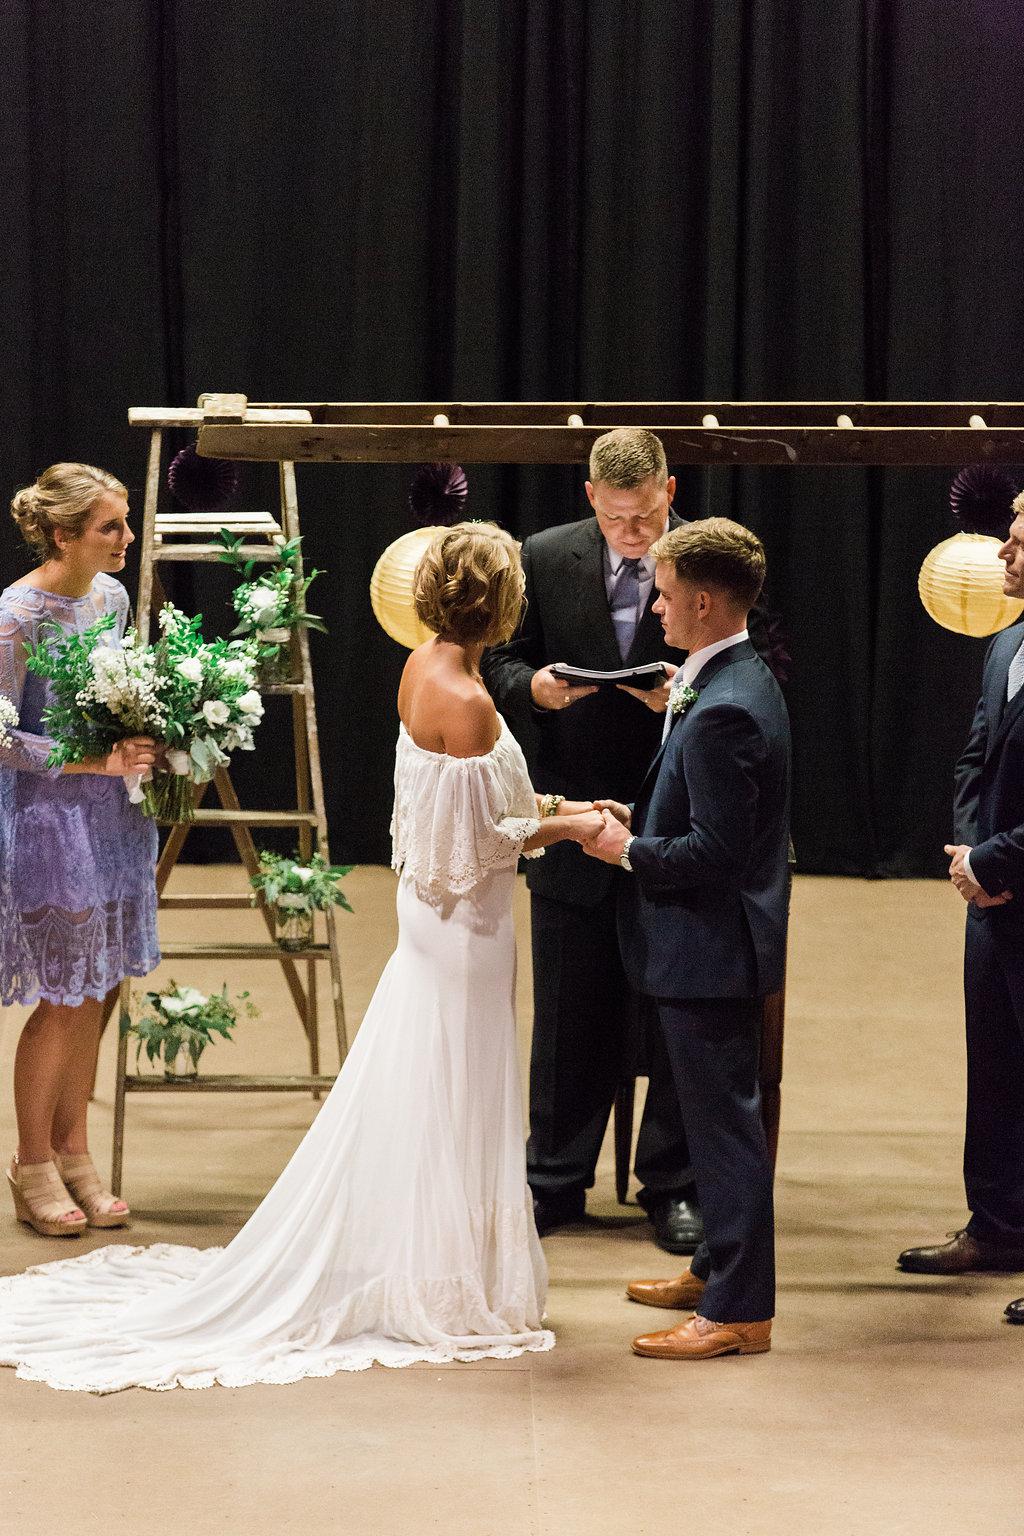 stacey-and-tj-wedding-apartment-b-photography-ivory-and-beau-bridal-boutique-savannah-wedding-dresses-daughters-of-simone-lu-boho-bride-boho-wedding-savannah-boho-wedding-savannah-weddings-savannah-bridal-gowns-savannah-wedding-38.jpg